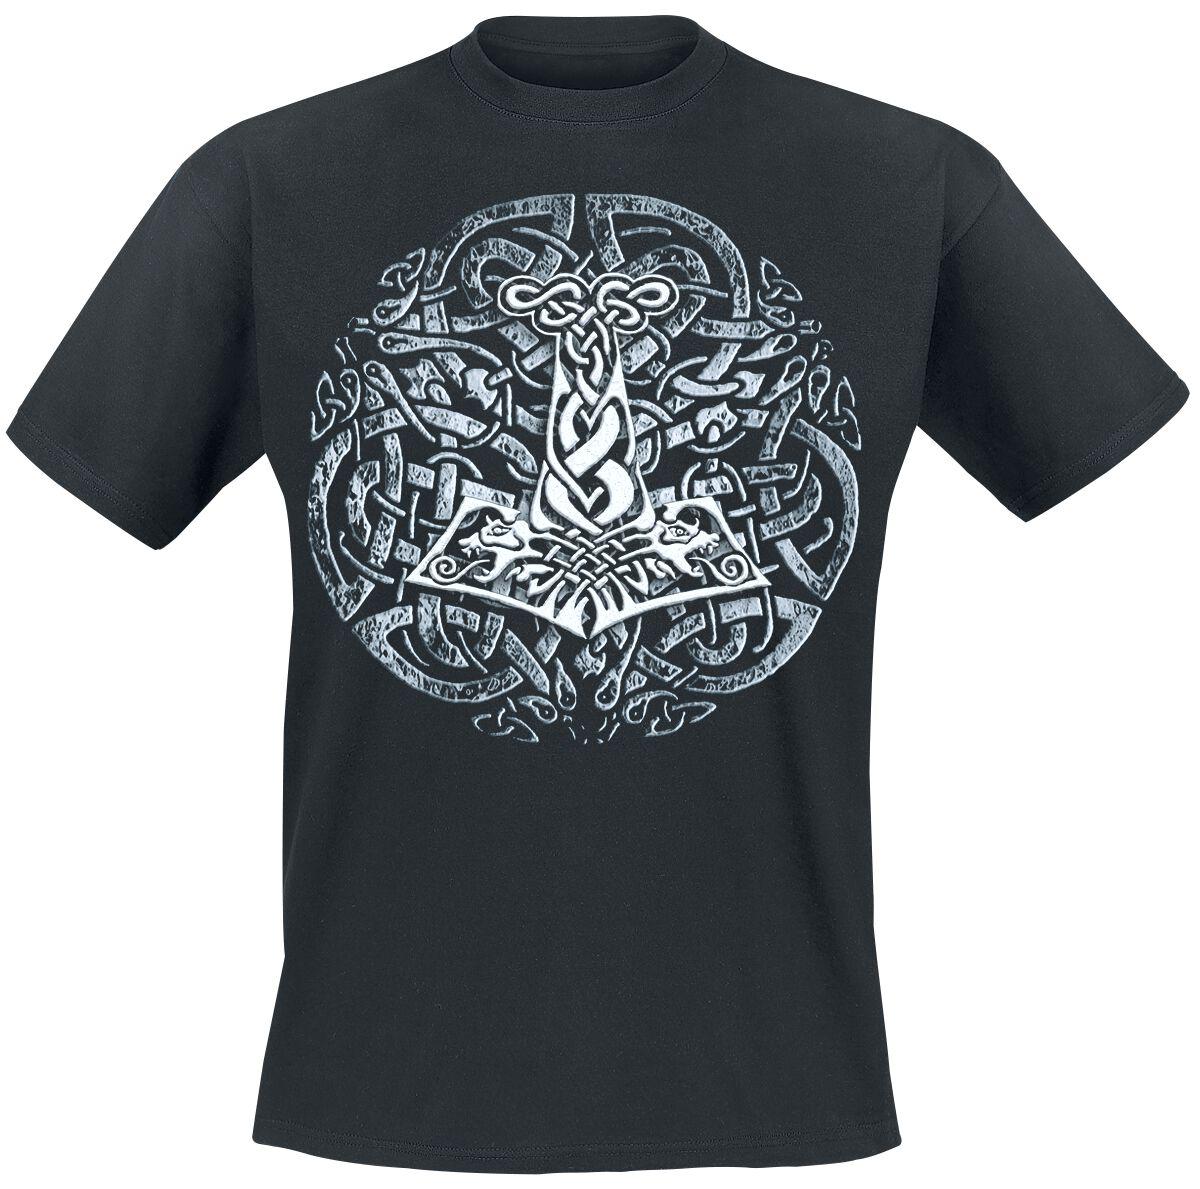 Motyw - Koszulki - T-Shirt Celtic Thorhammer T-Shirt czarny - 123989